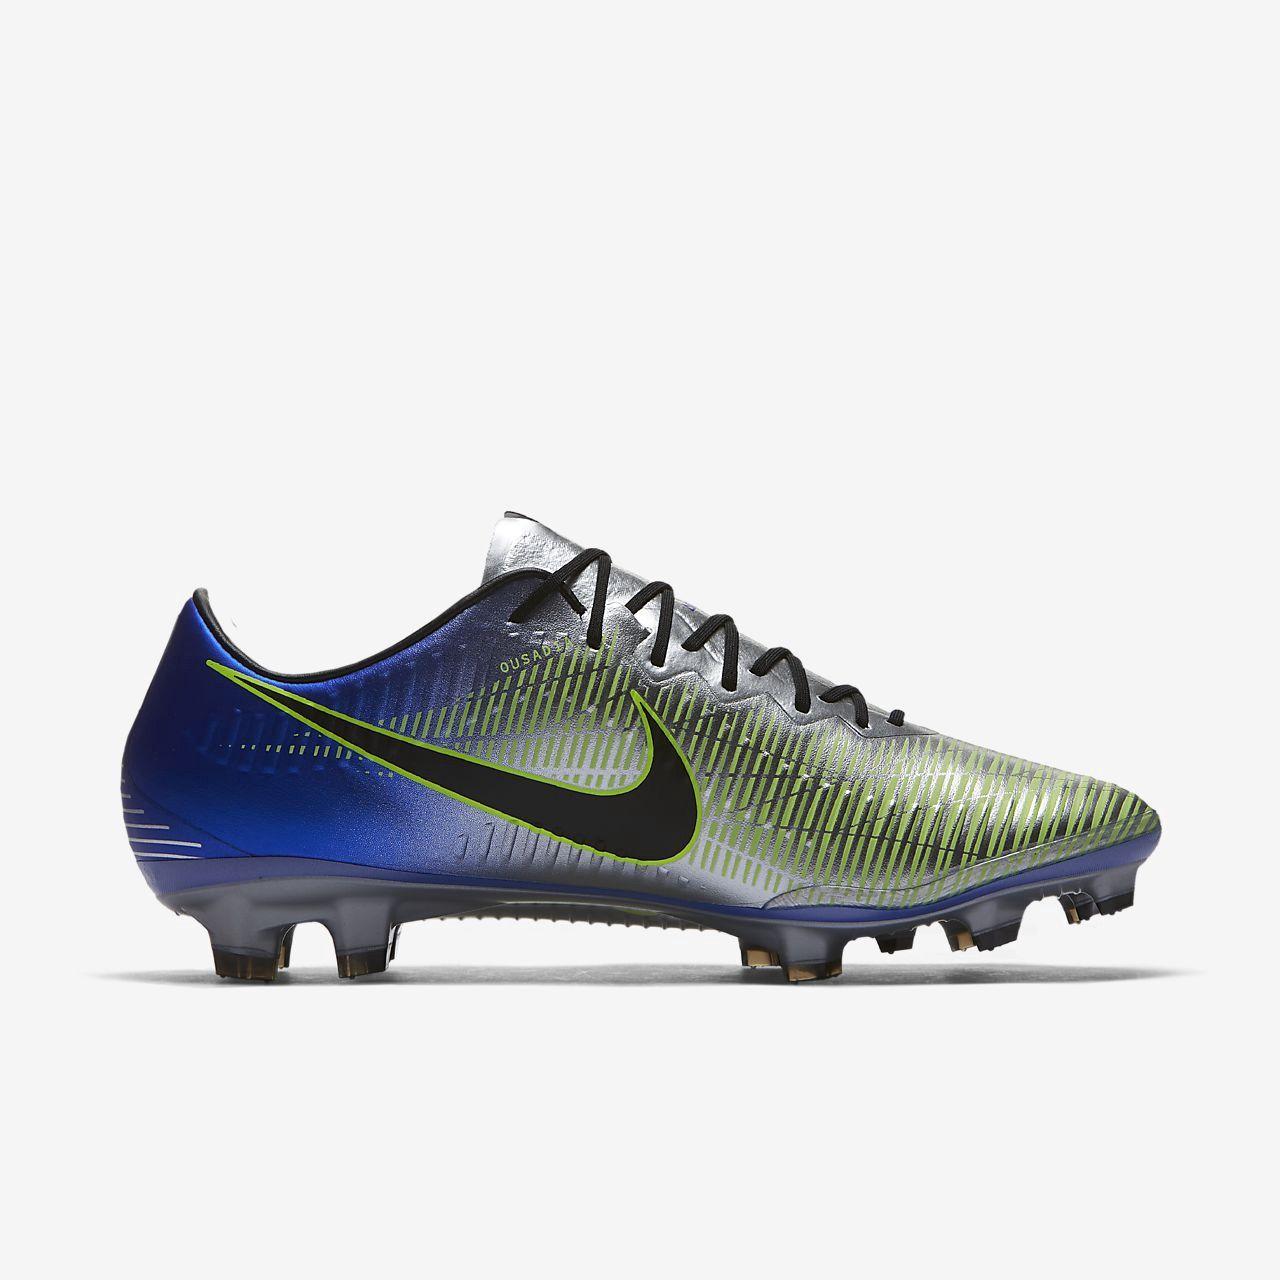 new product a4fd4 163df ... nike mercurial vapor xi neymar firm ground soccer cleat m 7.5 w 9